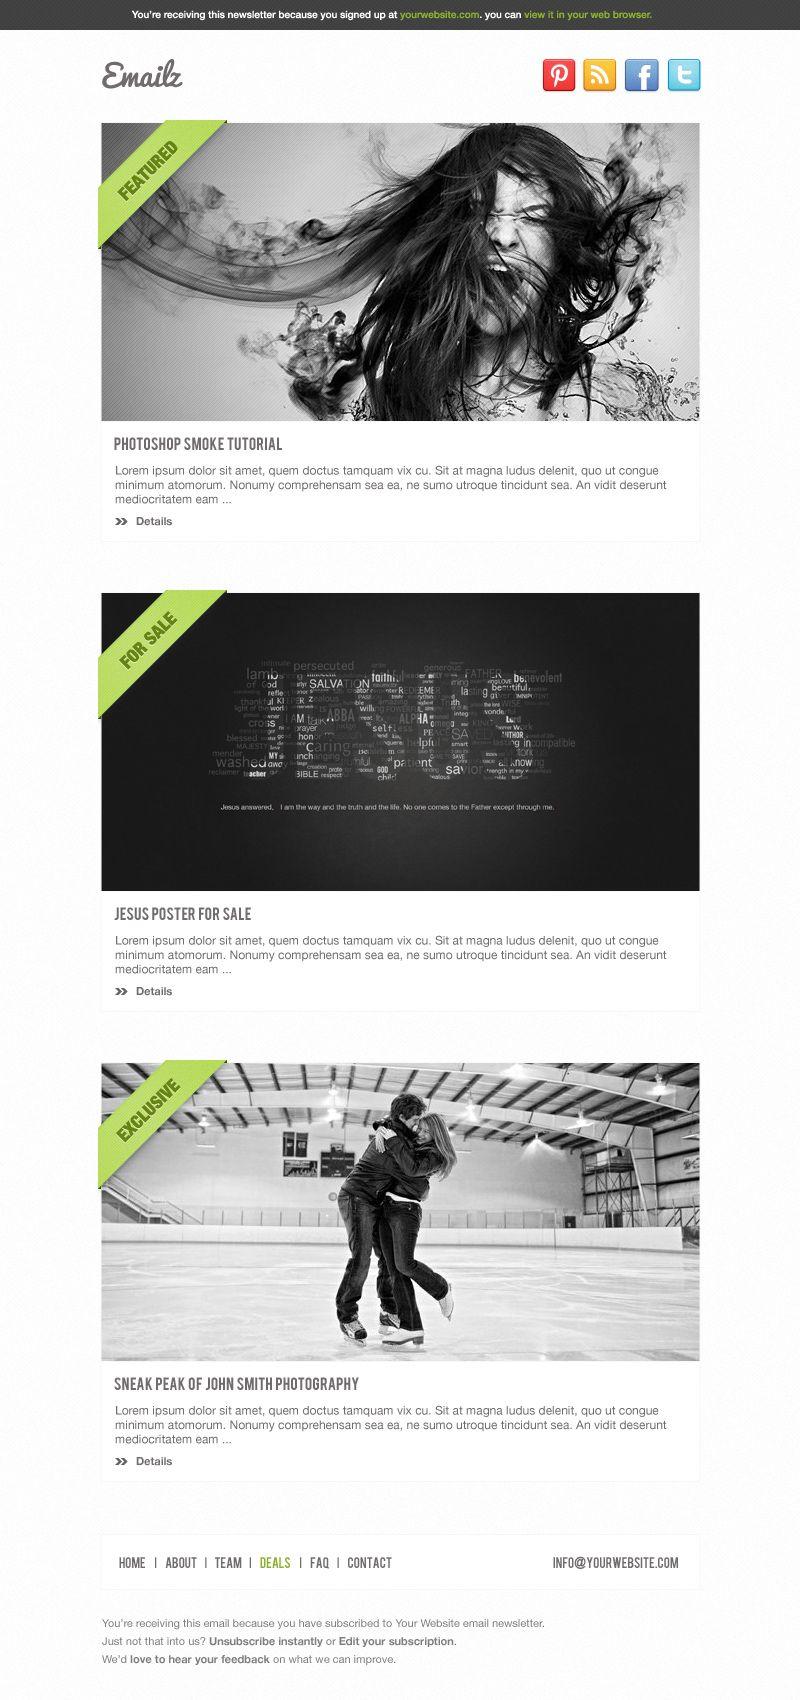 Email Template 5 | Best PSD Freebies www.bestpsdfreebies.com/freebie ...